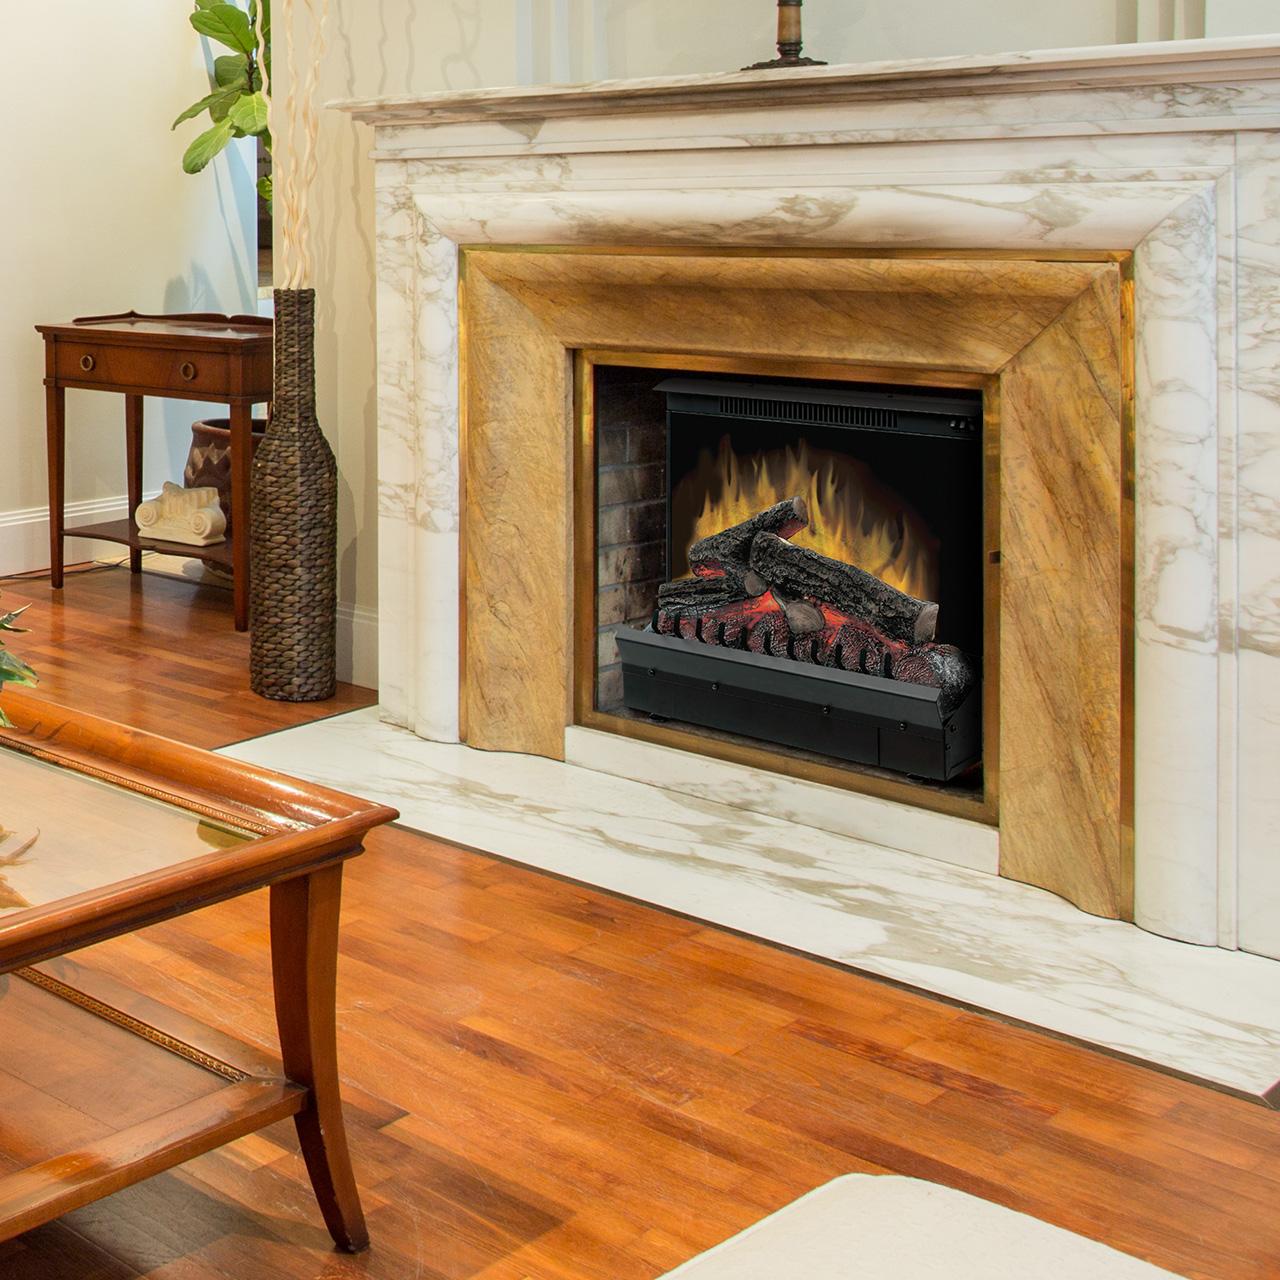 Strange Dimplex Standard 23 Log Set Electric Fireplace Insert Dfi2309 Interior Design Ideas Gentotryabchikinfo